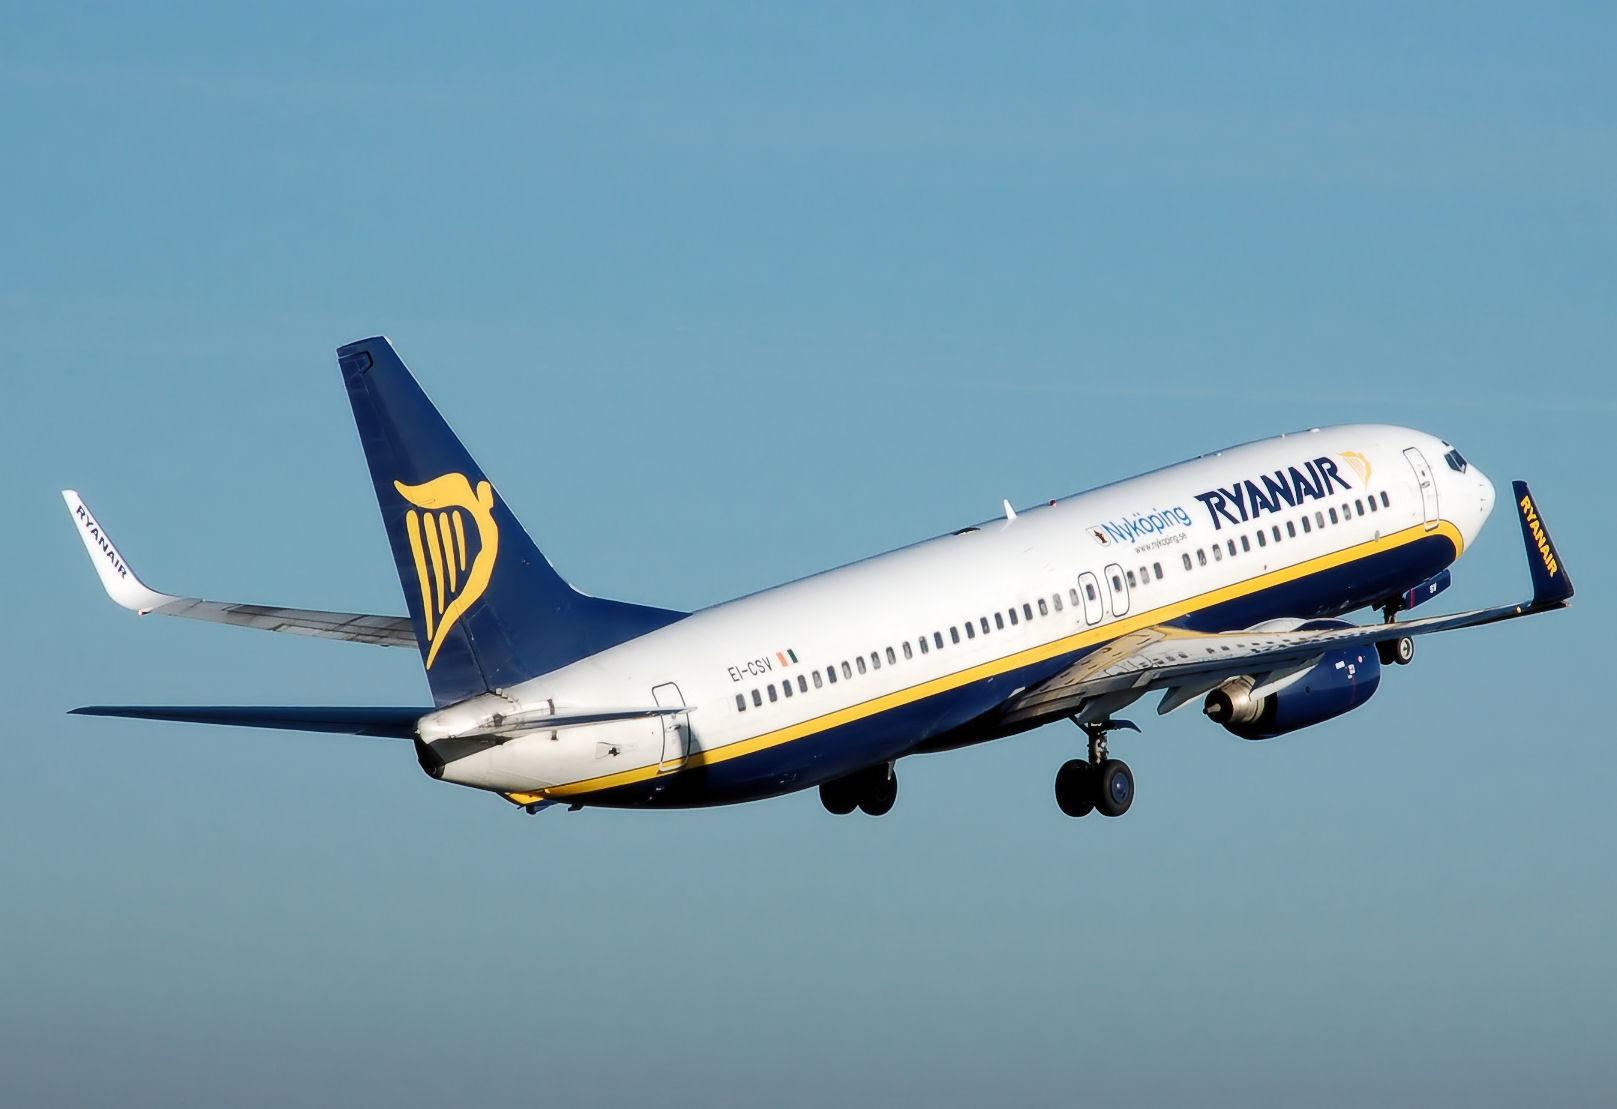 Ryanair_b737-800_nykoping_ei-csv_arp.jpg